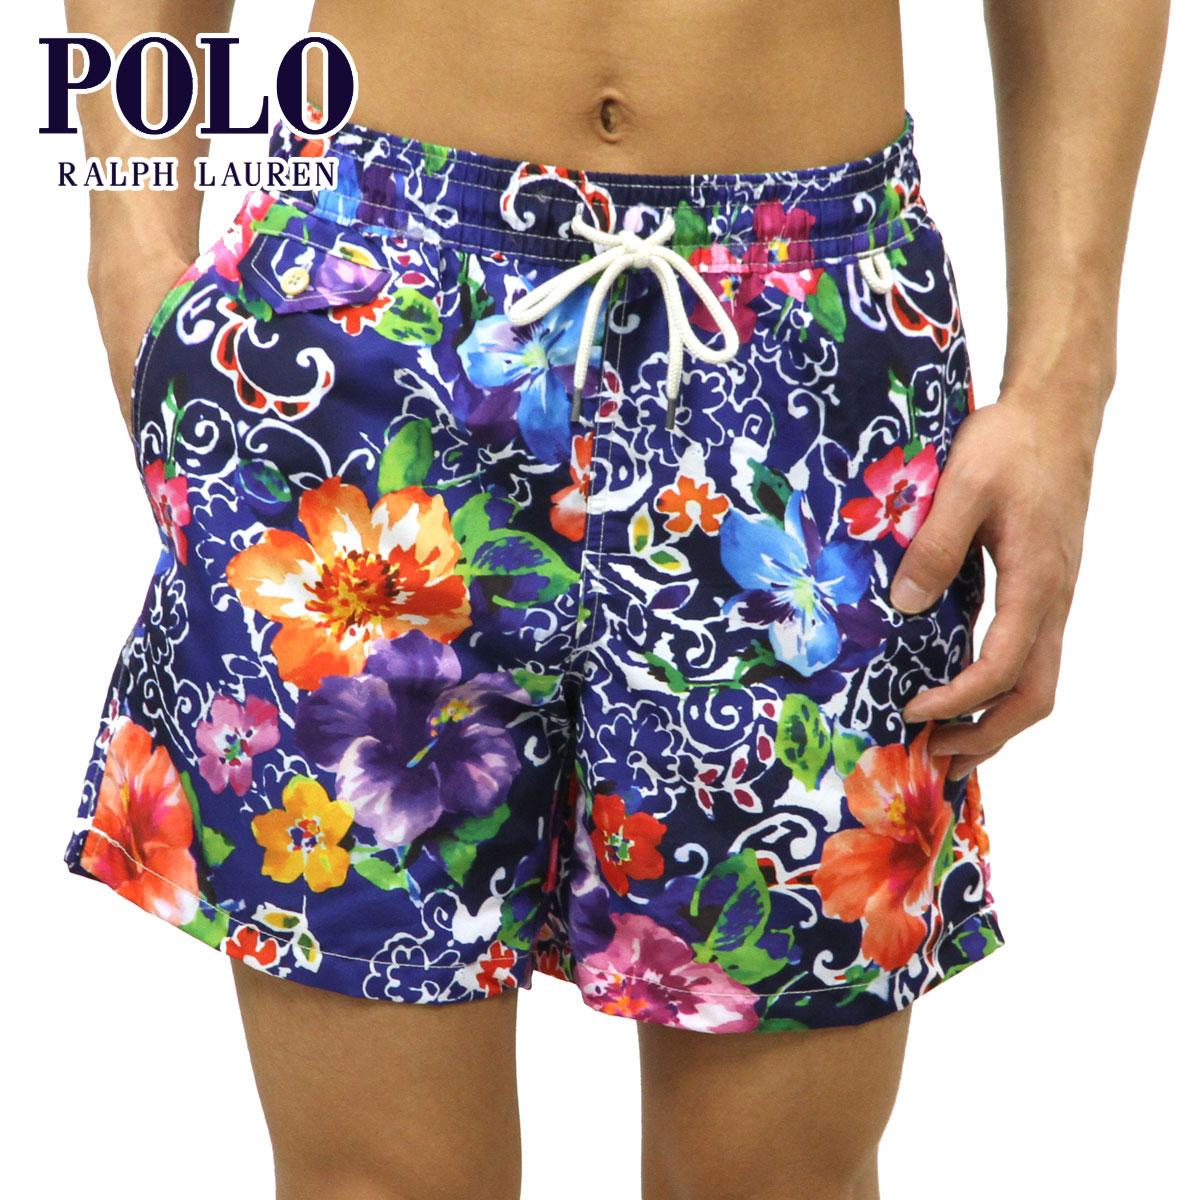 b02928b218 new style polo ralph lauren polo ralph lauren regular article men swimming  underwear swimsuit polo flower